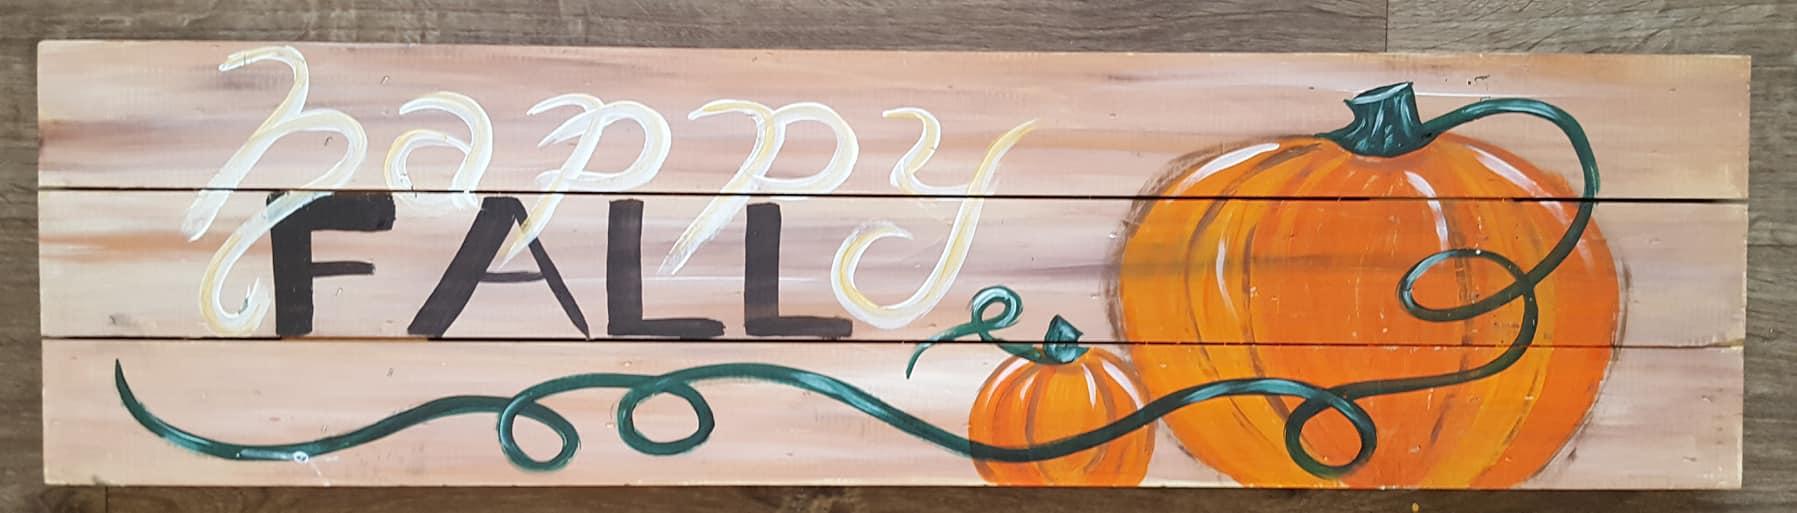 Happy Fall Pallet $30